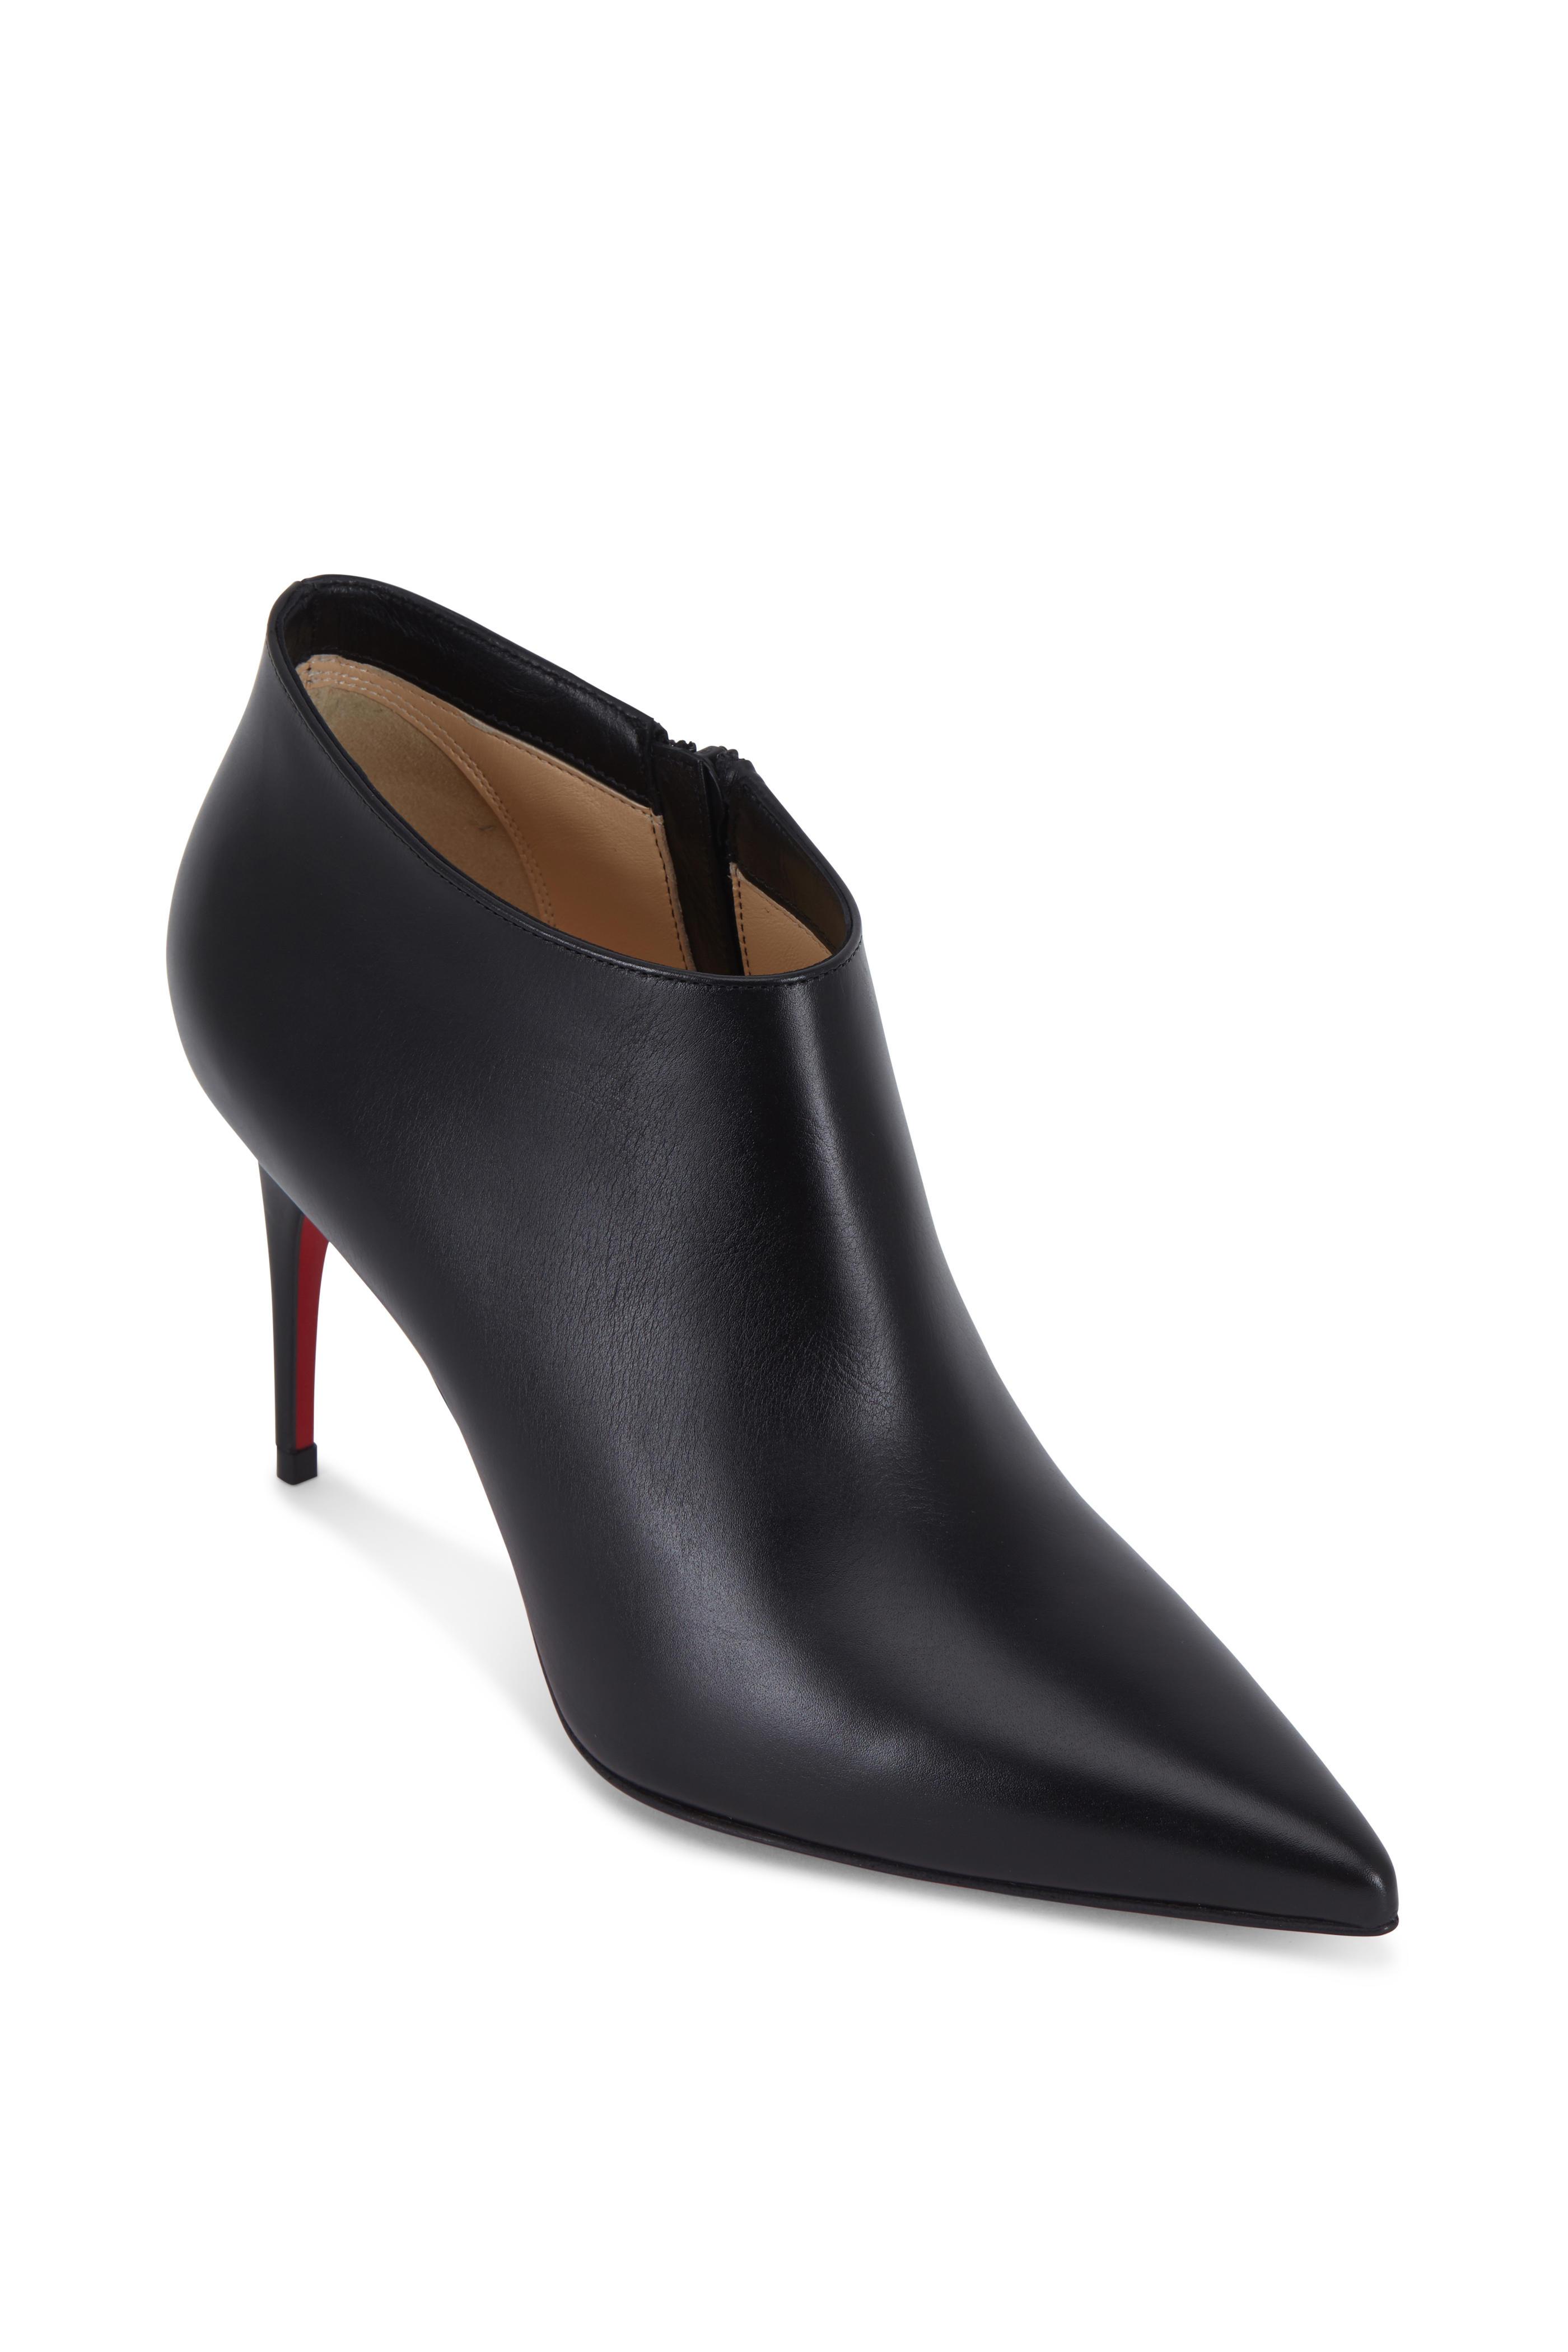 the latest d5da2 6cd75 Christian Louboutin - Gorgona Black Leather Ankle Boot, 85mm ...